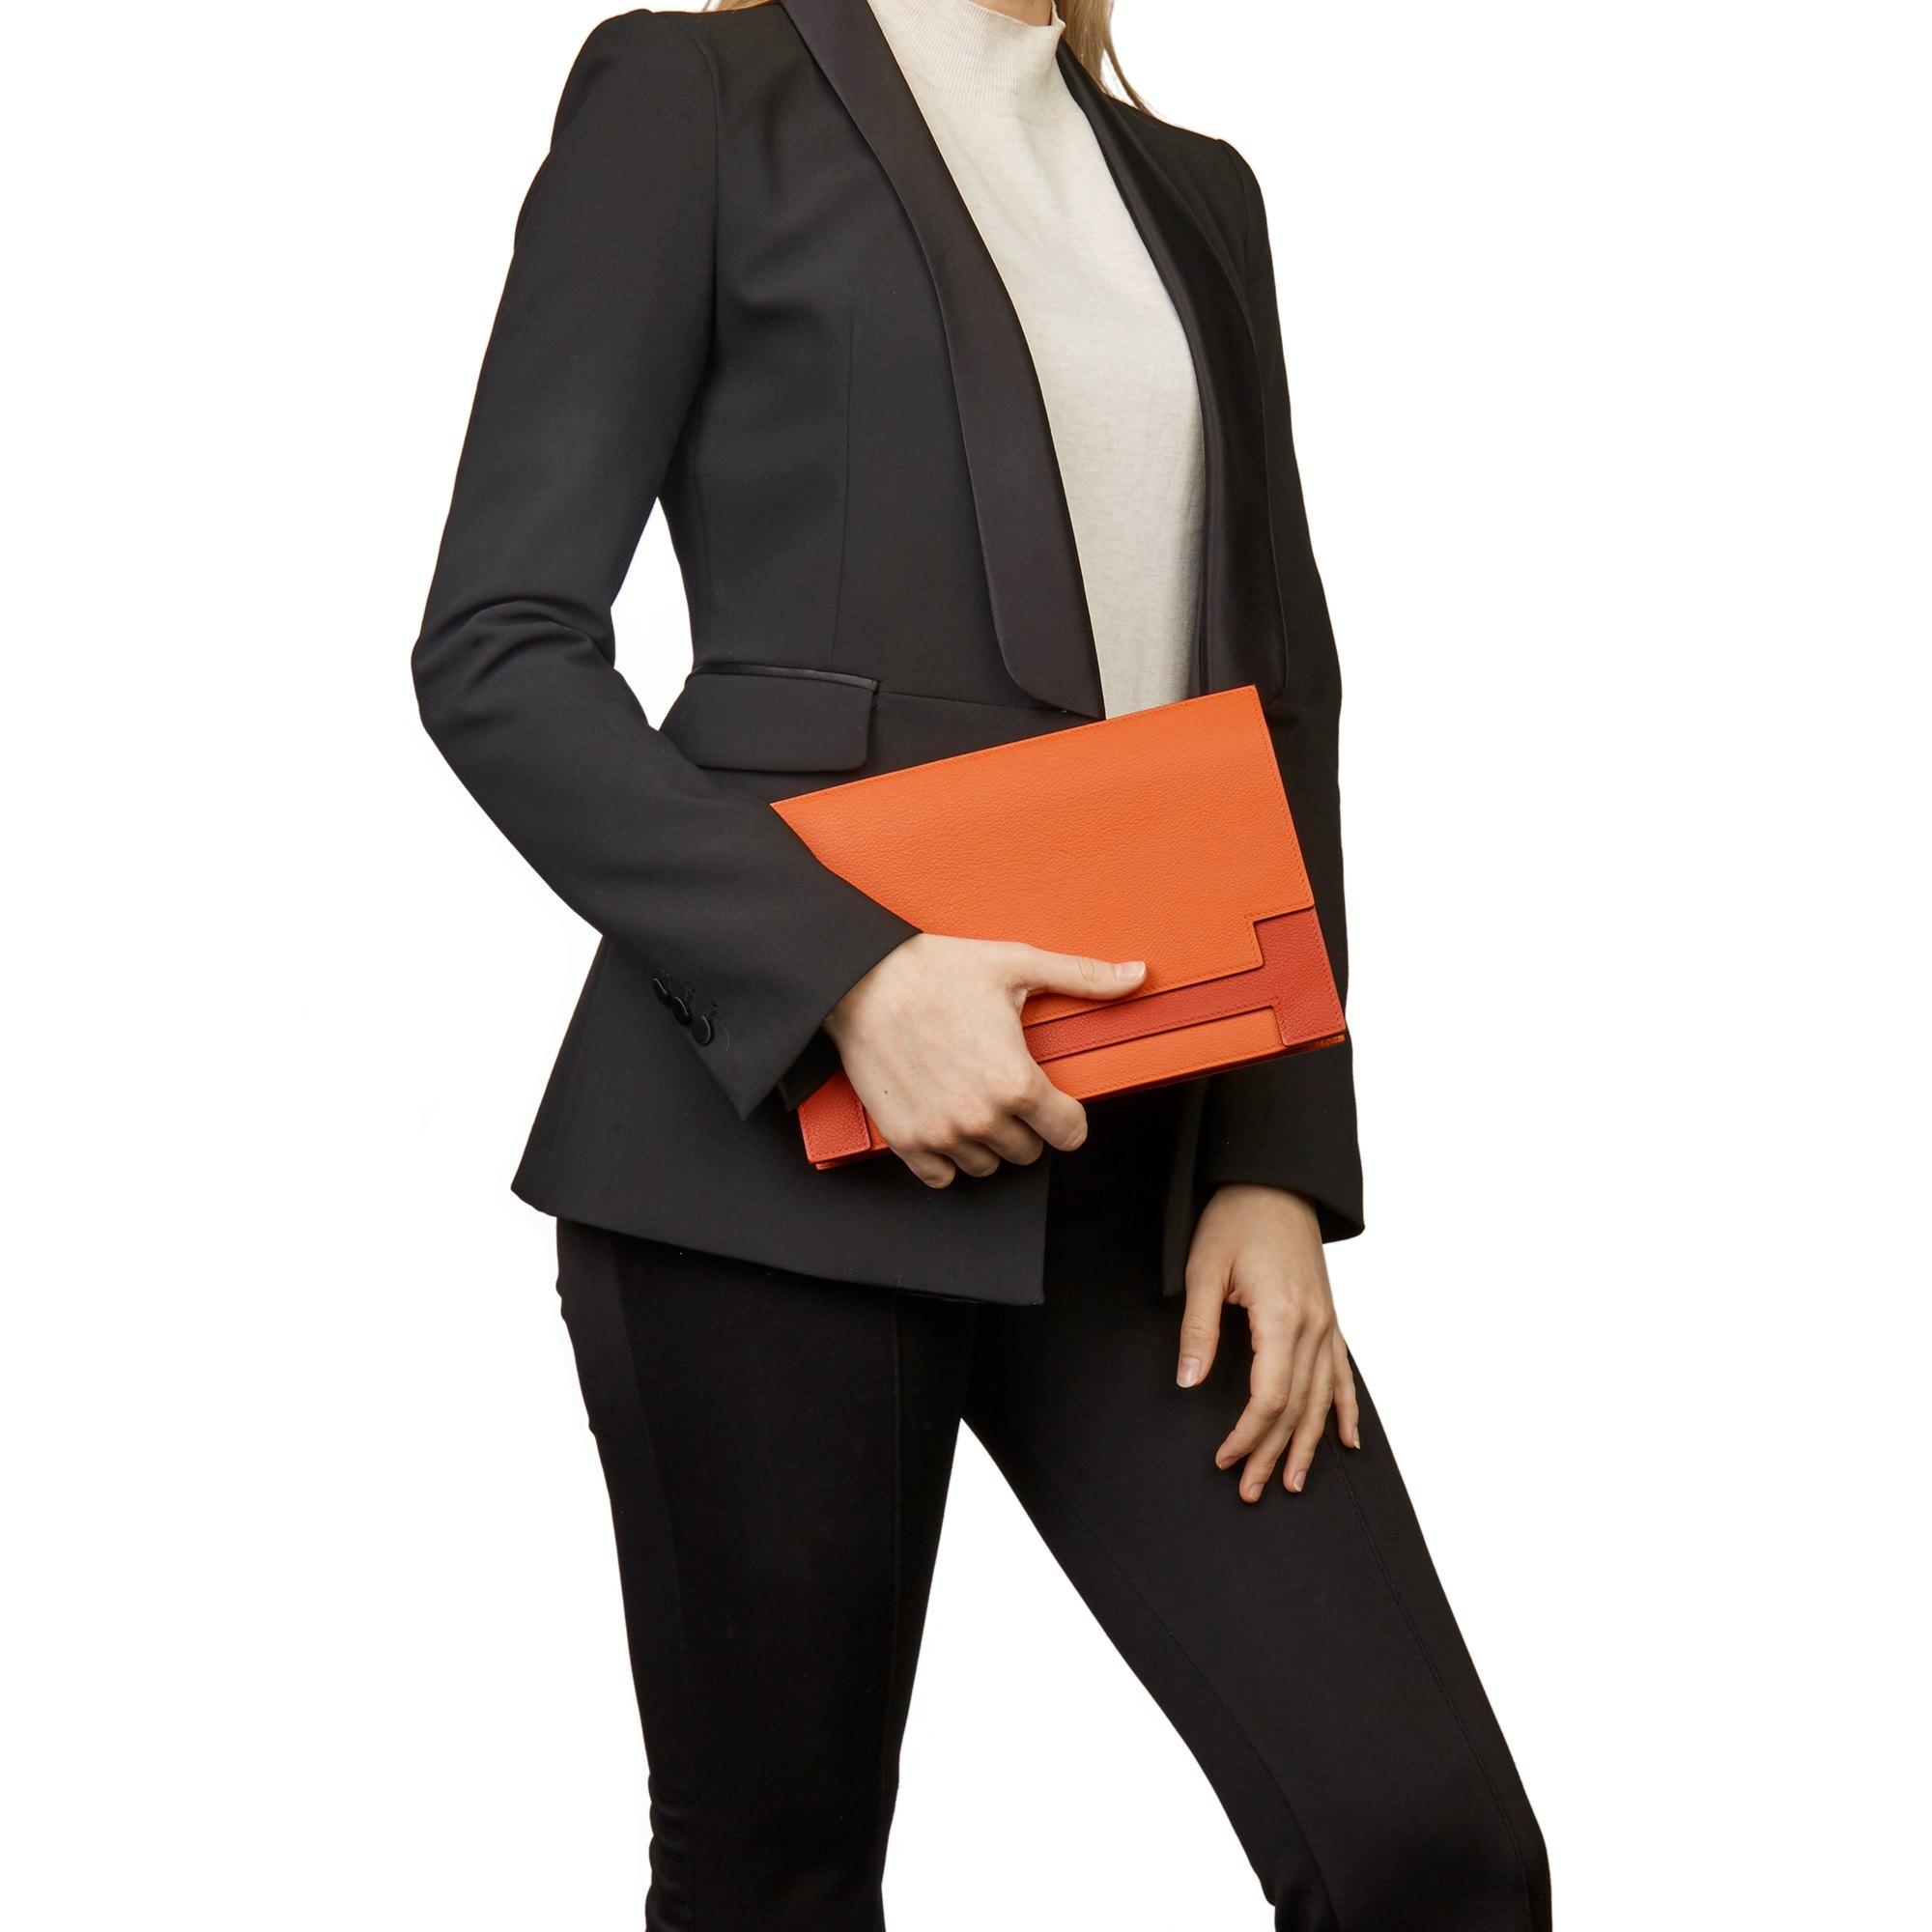 Hermès Rouge Tomate & Rouge Grenat Evercolour Leather Multiplis Clutch